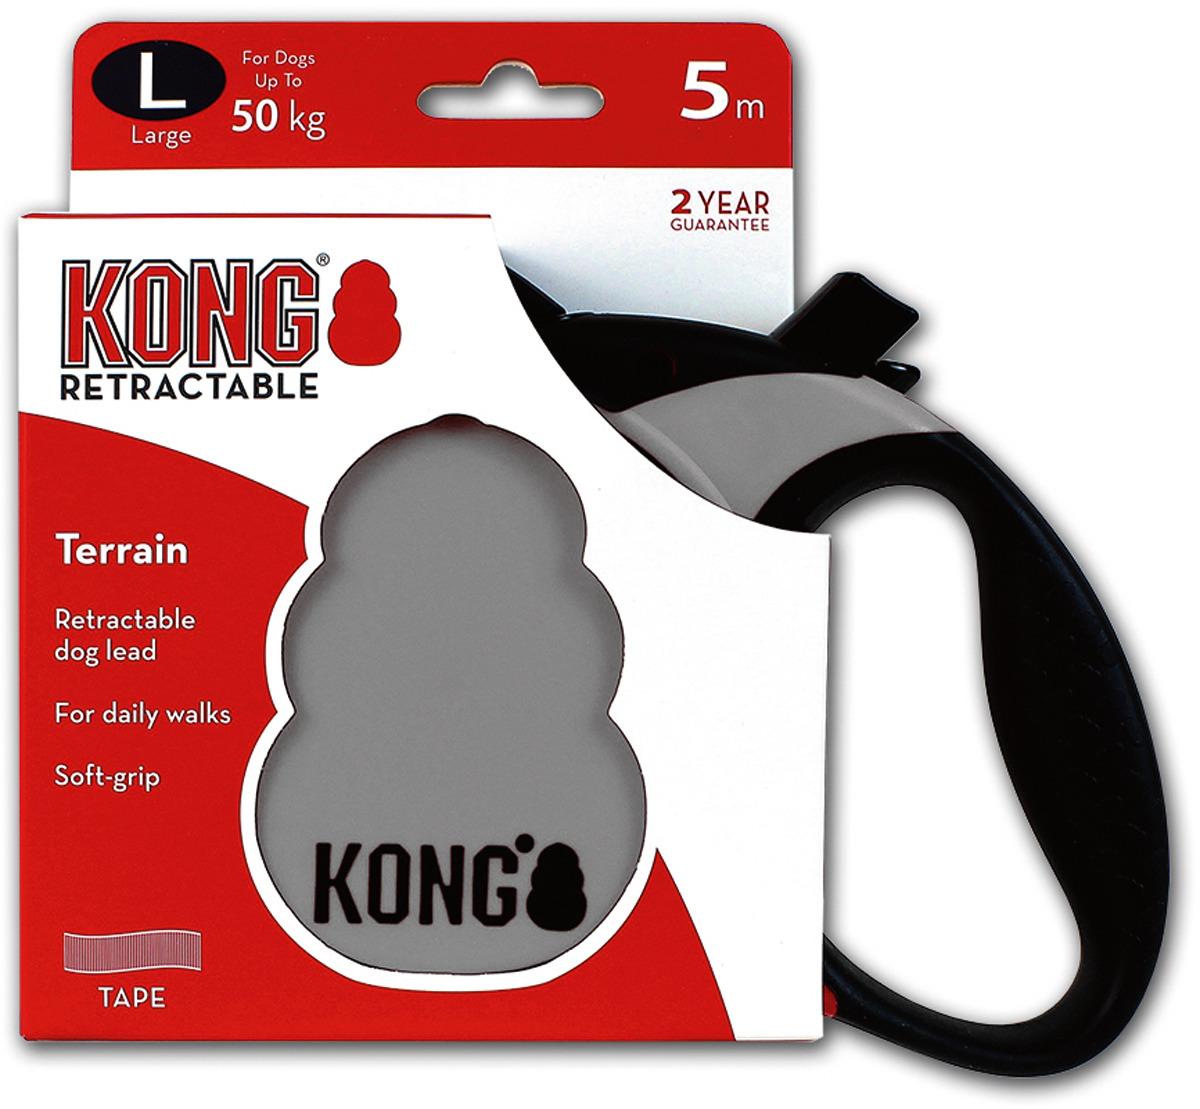 Поводок-рулетка для собак Kong Terrain L, цвет: серый, до 50 кг, 5 м